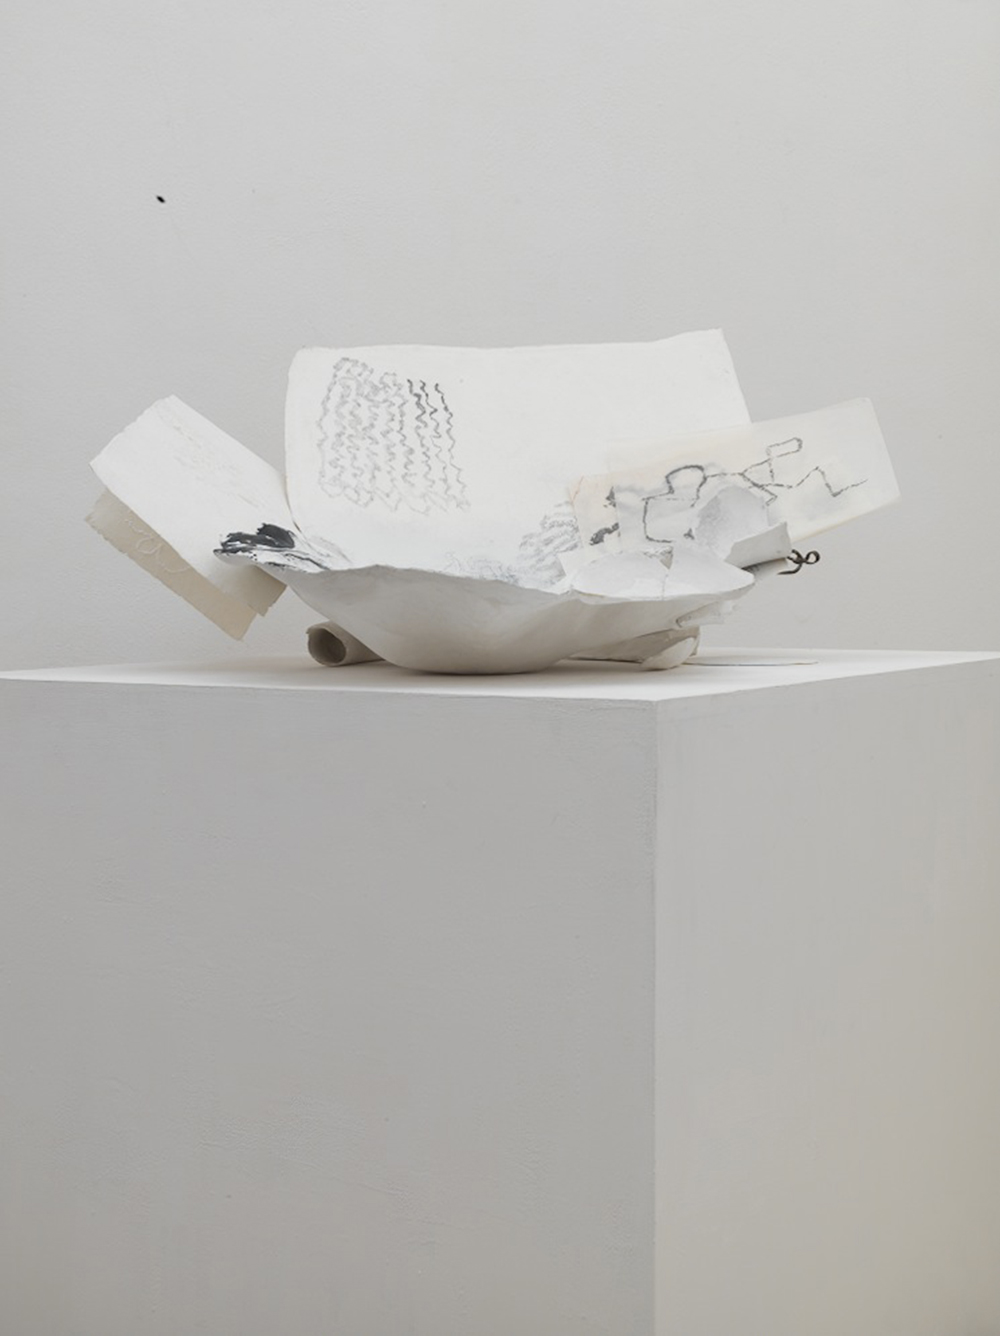 Grotta in casa, 2013, tecnica mista su carta, gessi, manufatti, misure variabili